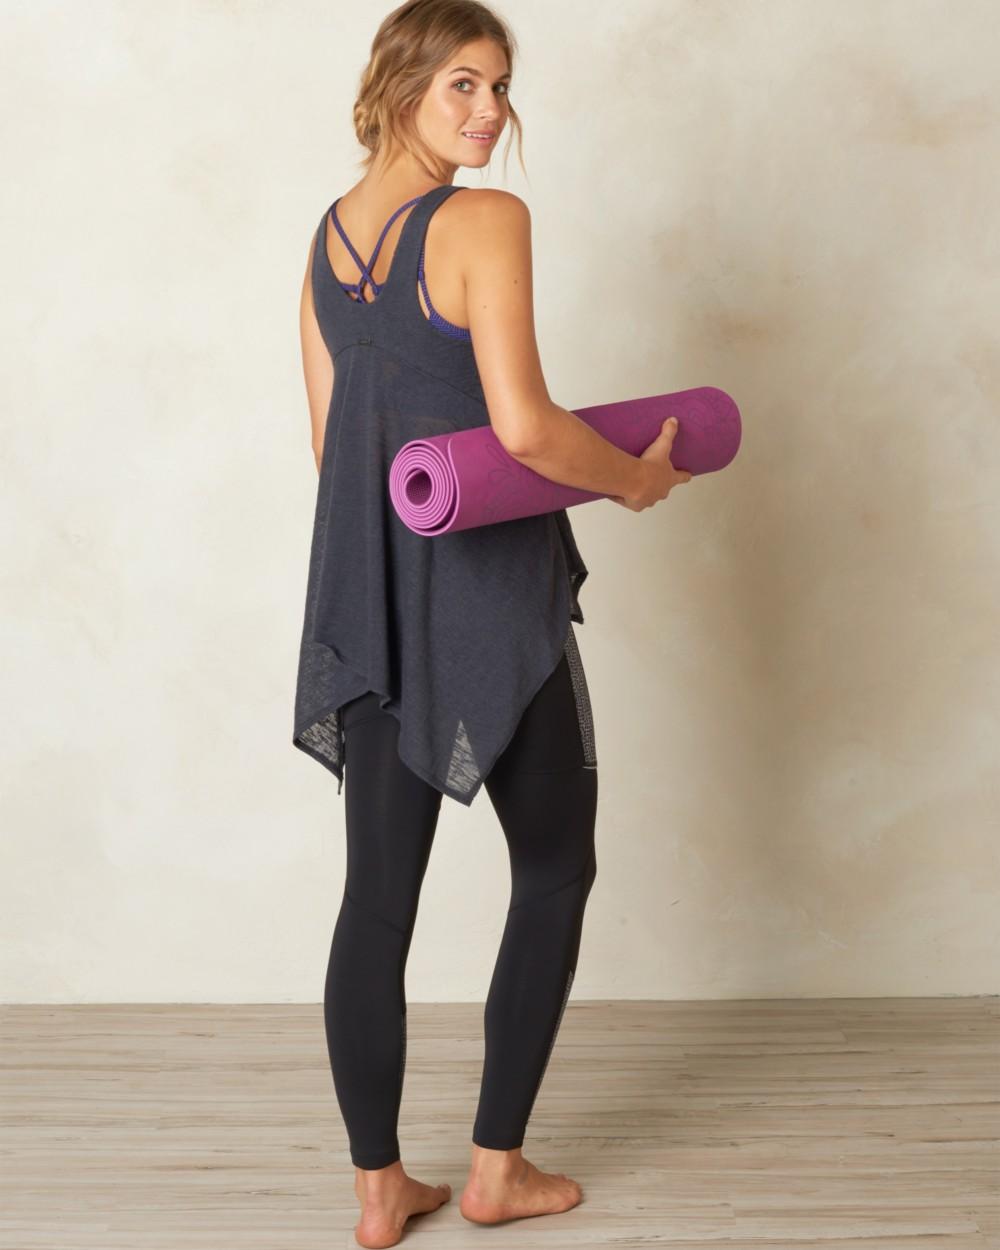 2016 Prana Yoga Clothing Whisper Yoga Tank in Coal